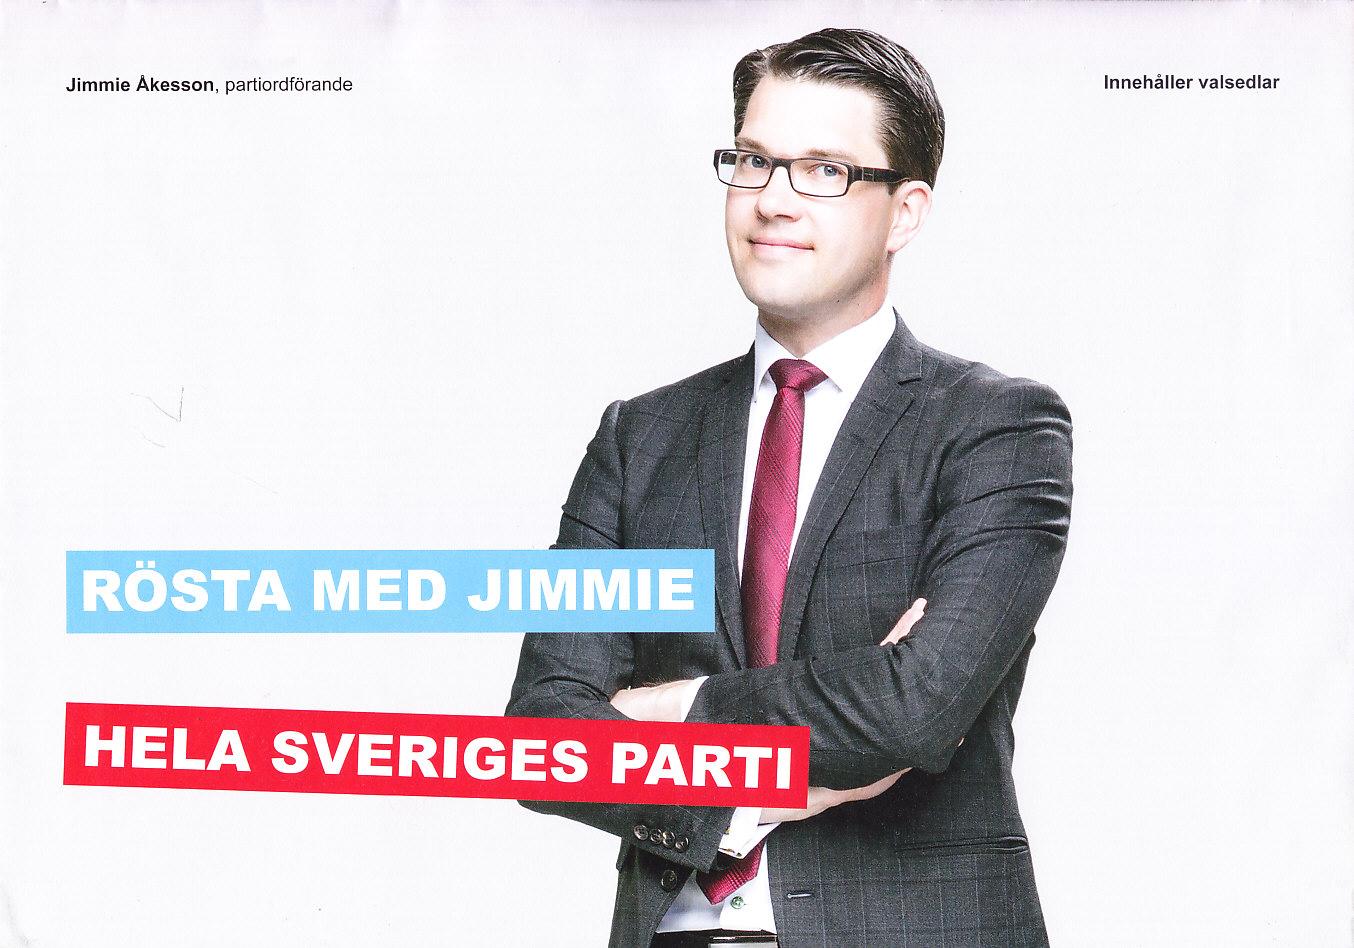 Sverigedemokraterna_envelope1_0001